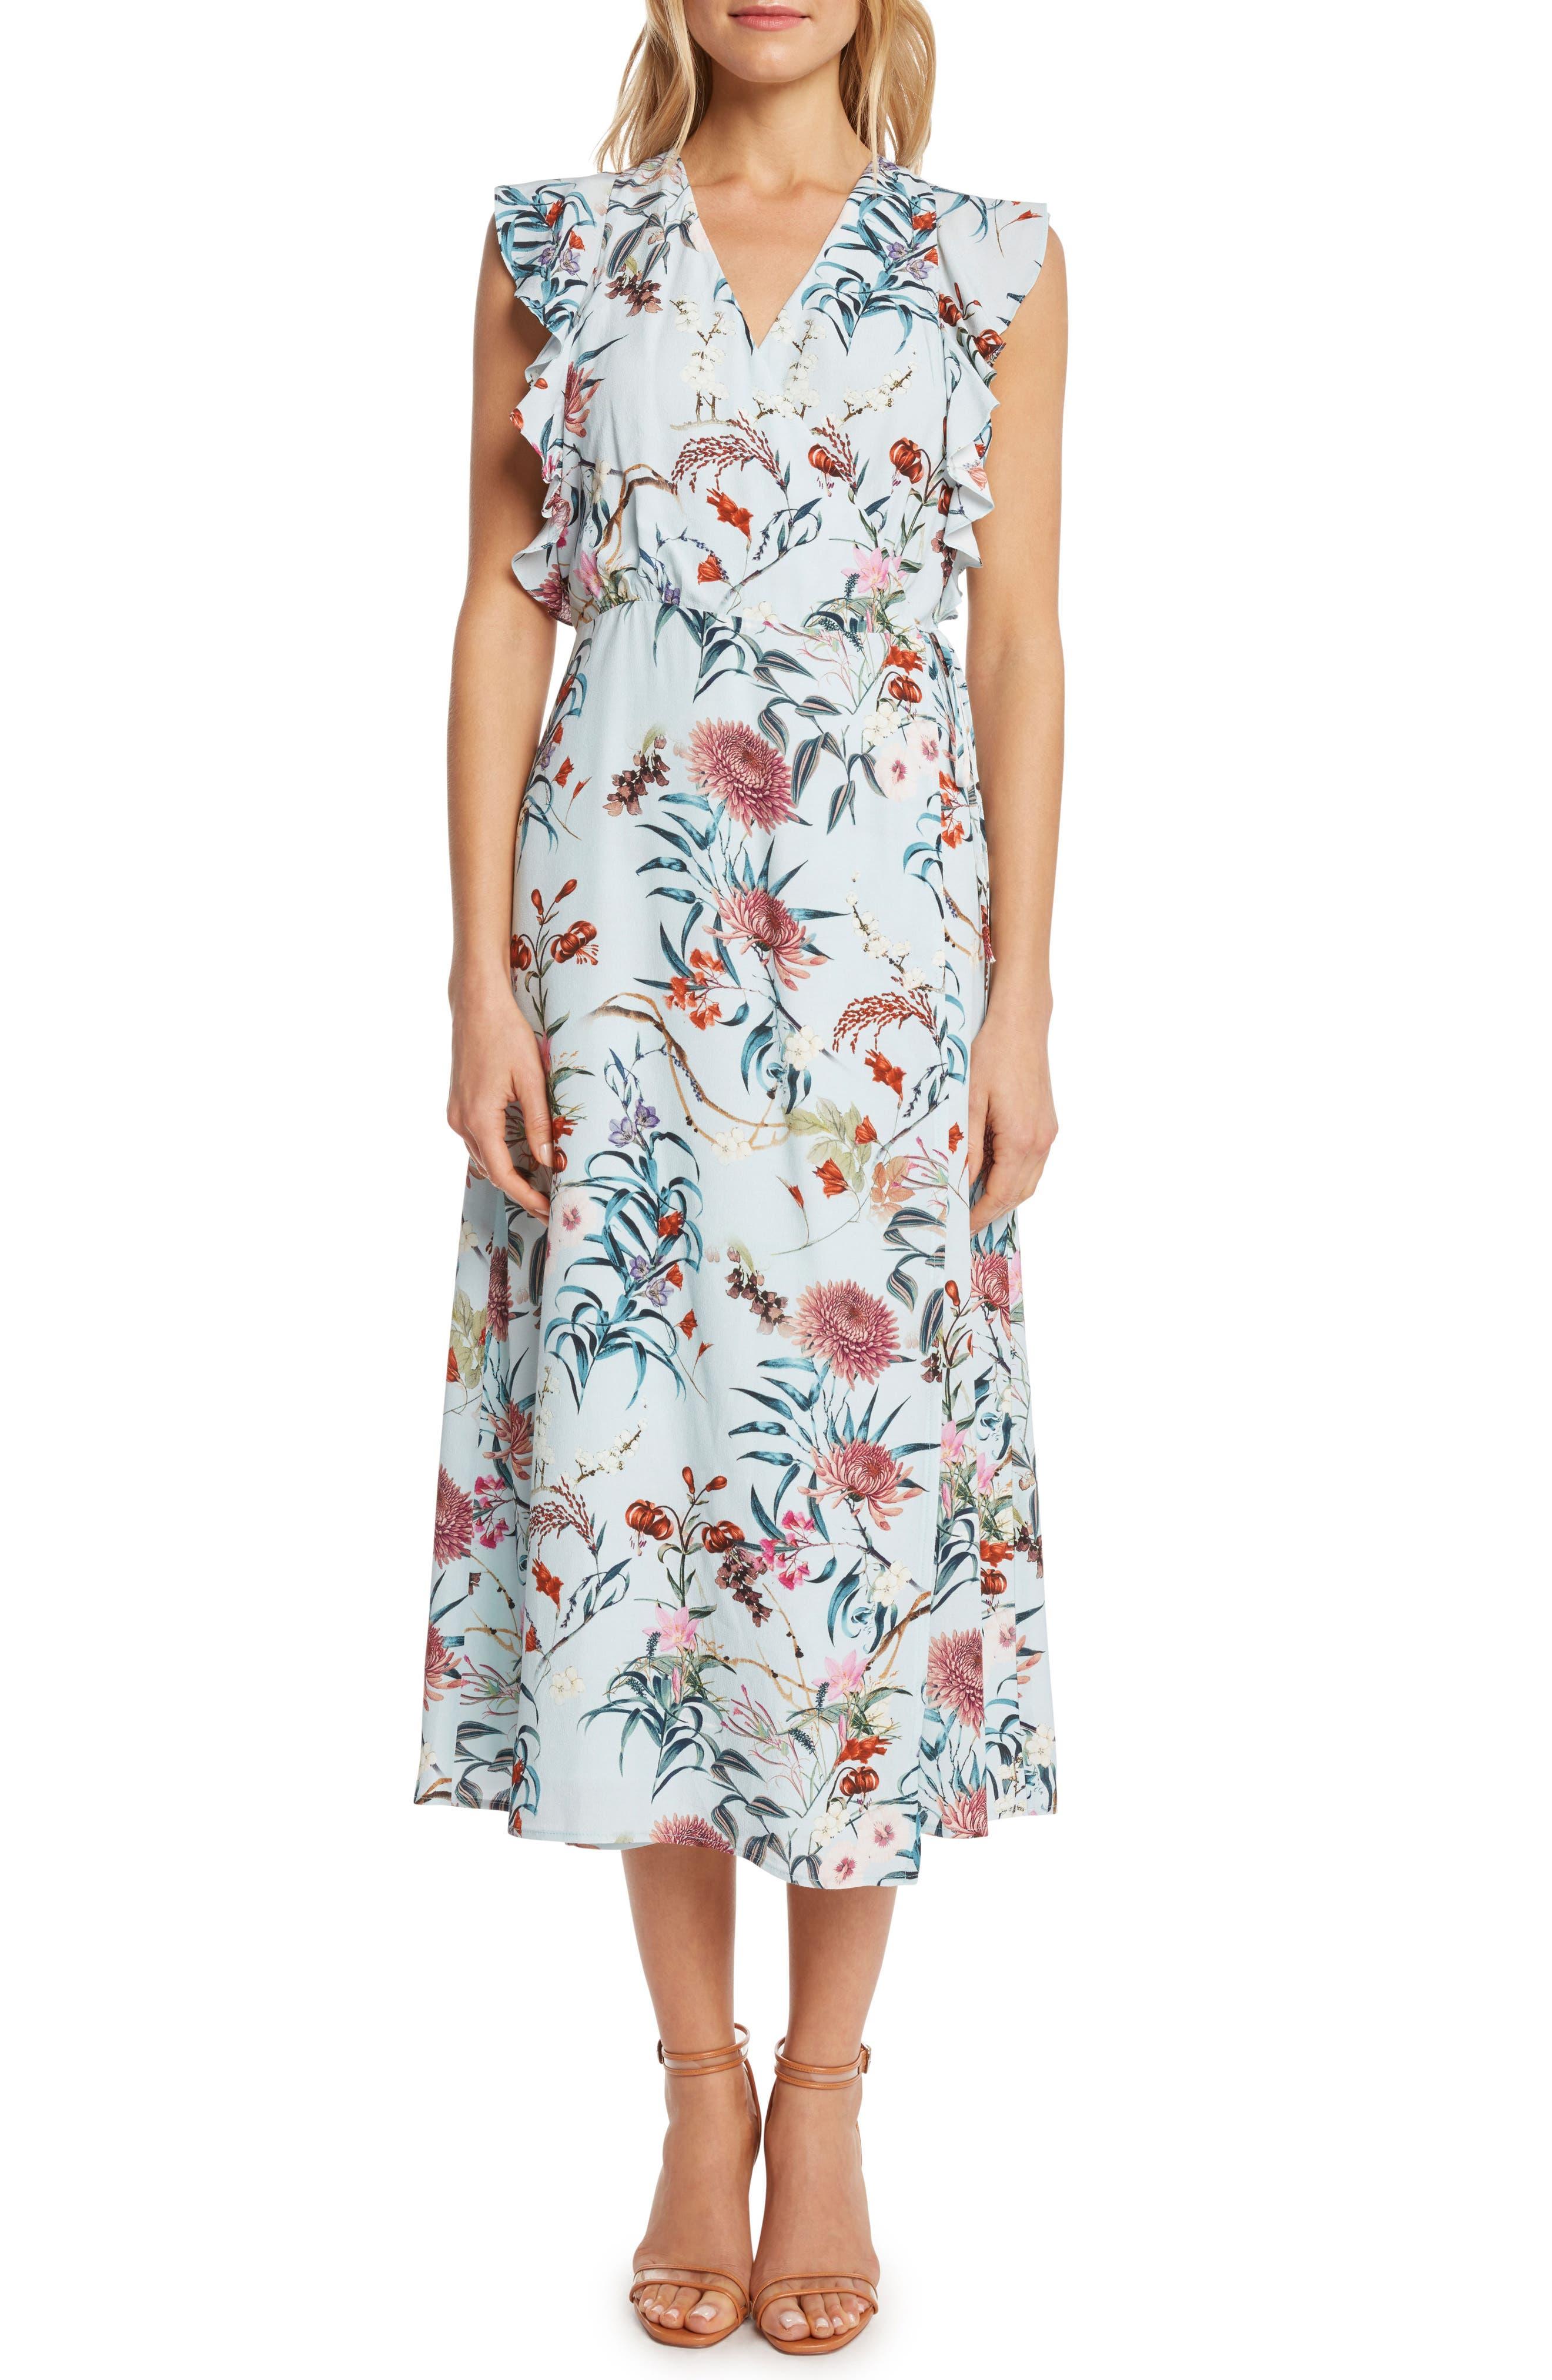 WILLOW & CLAY,                             Print Wrap Midi Dress,                             Main thumbnail 1, color,                             434